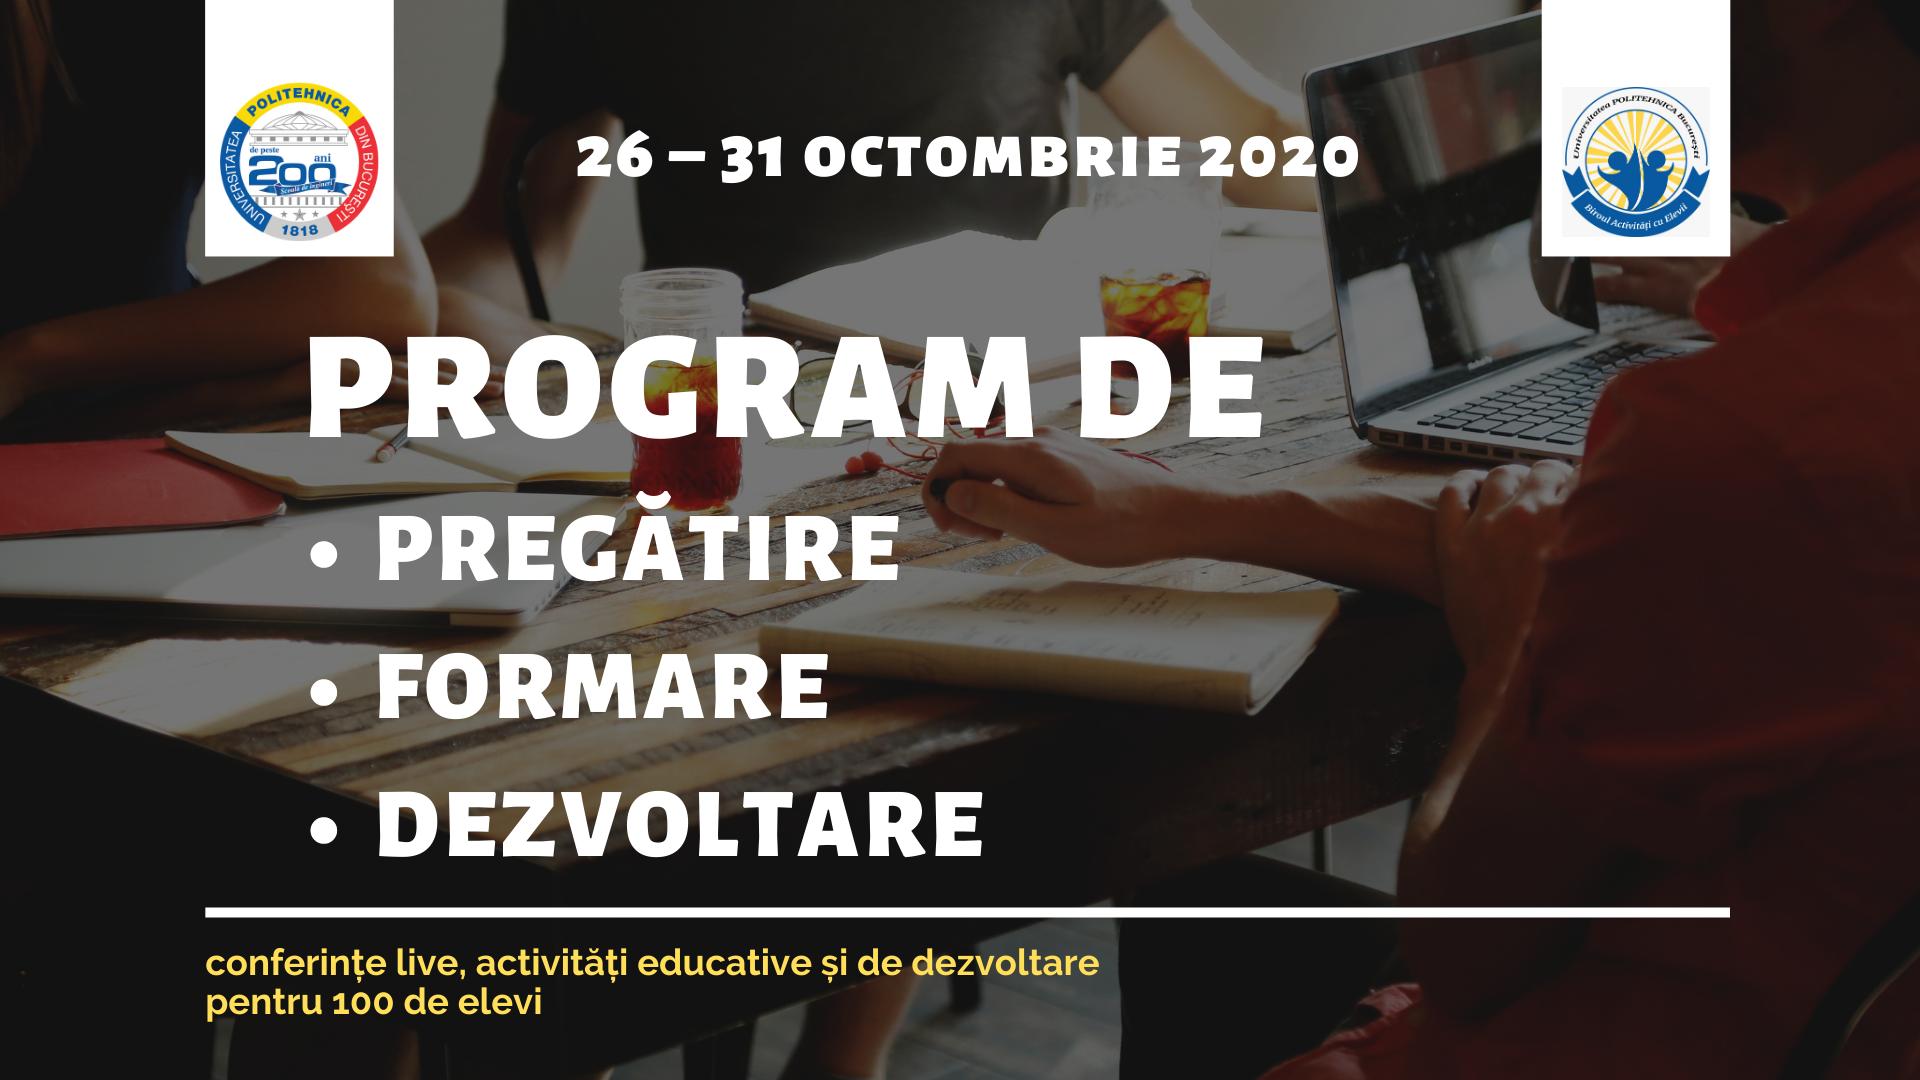 PROGRAM DE PREGĂTIRE/FORMARE/DEZVOLTARE